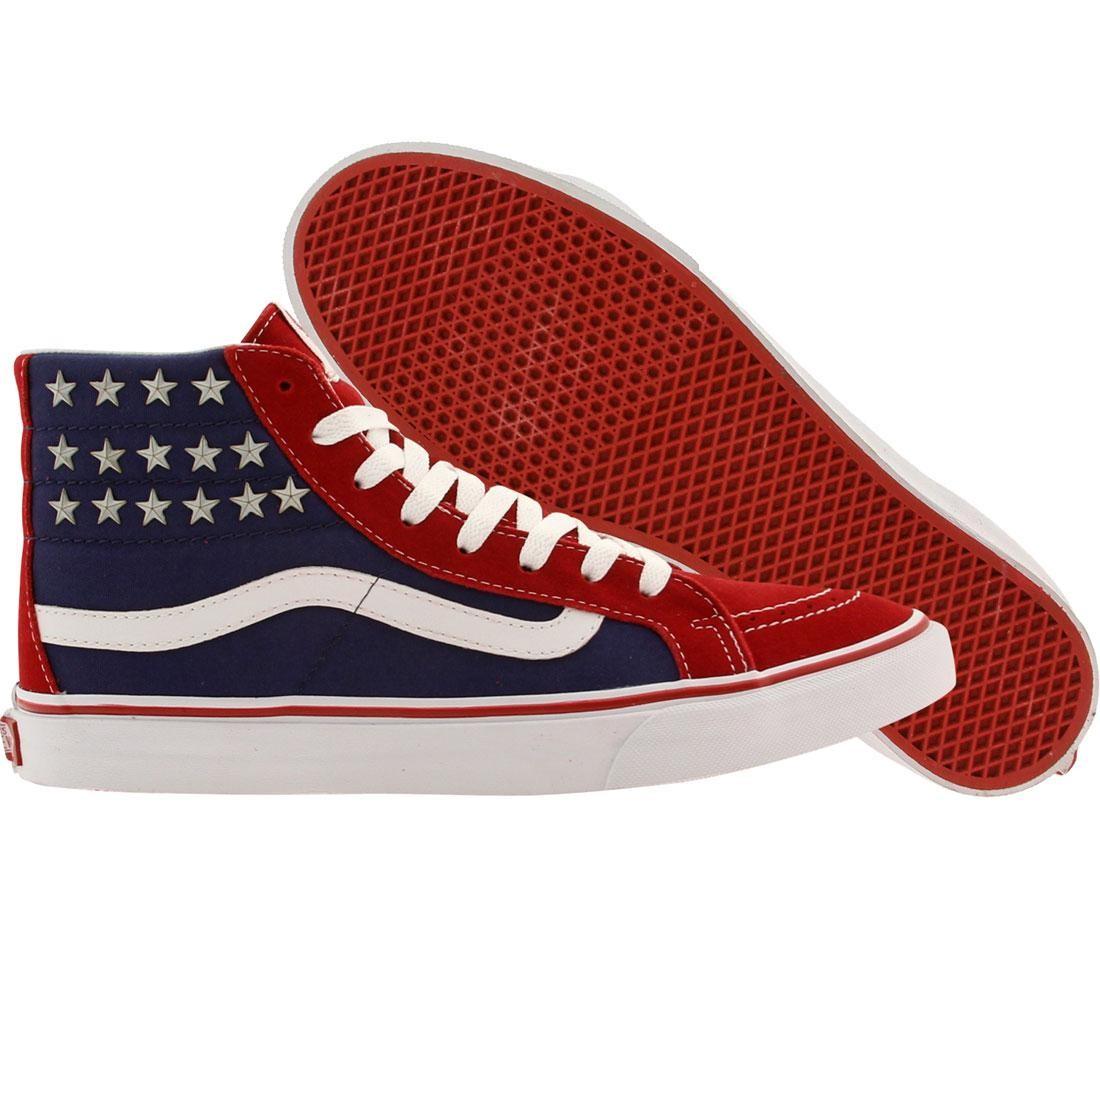 9641ccb6f3 Vans Men Sk8-Hi Slim - Studded Stars red blue